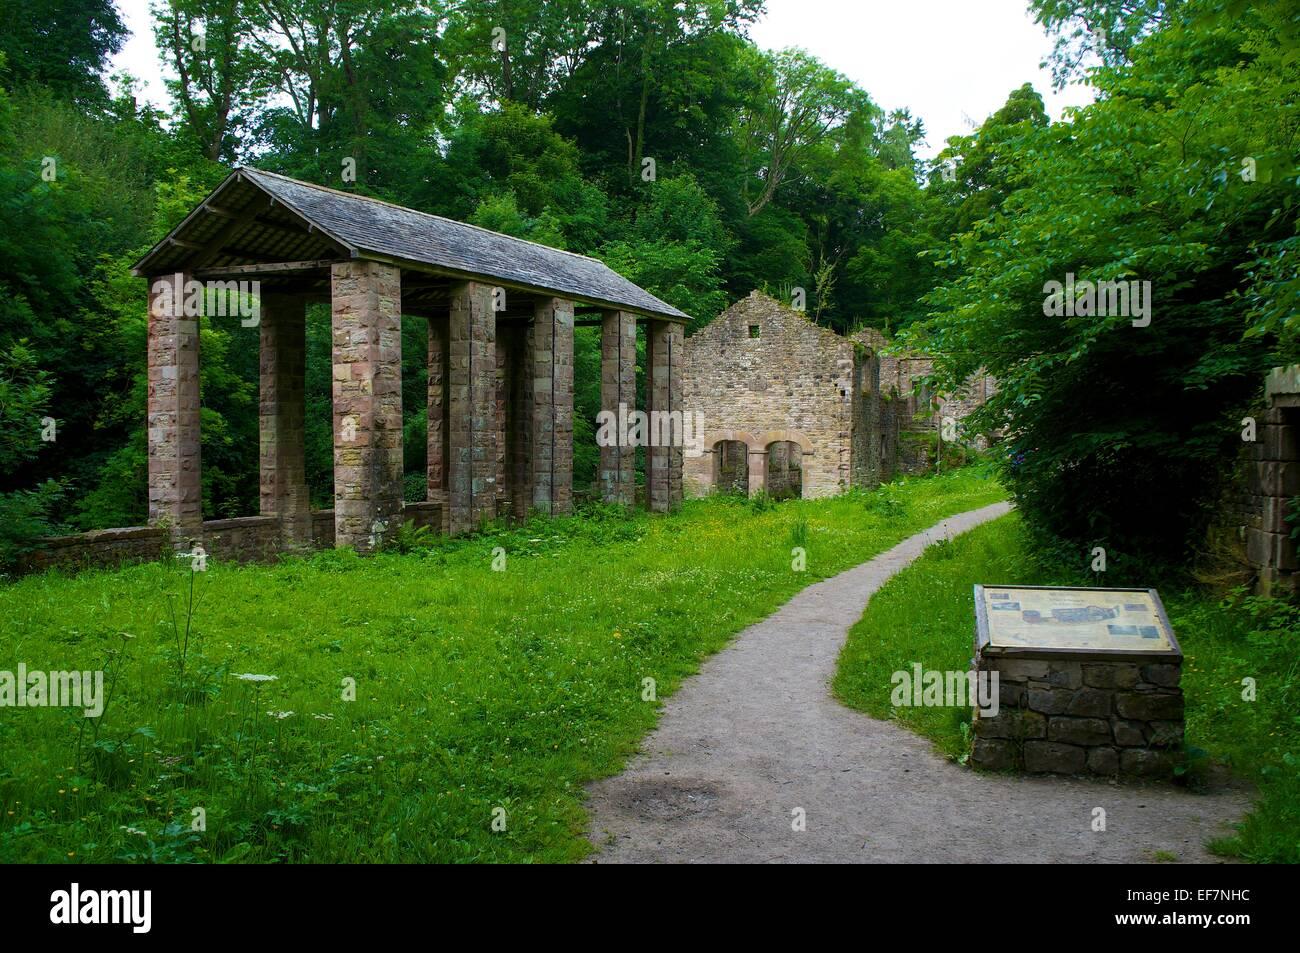 Spule Mühle Howk Calbeck Cumbria England UK. Stockbild